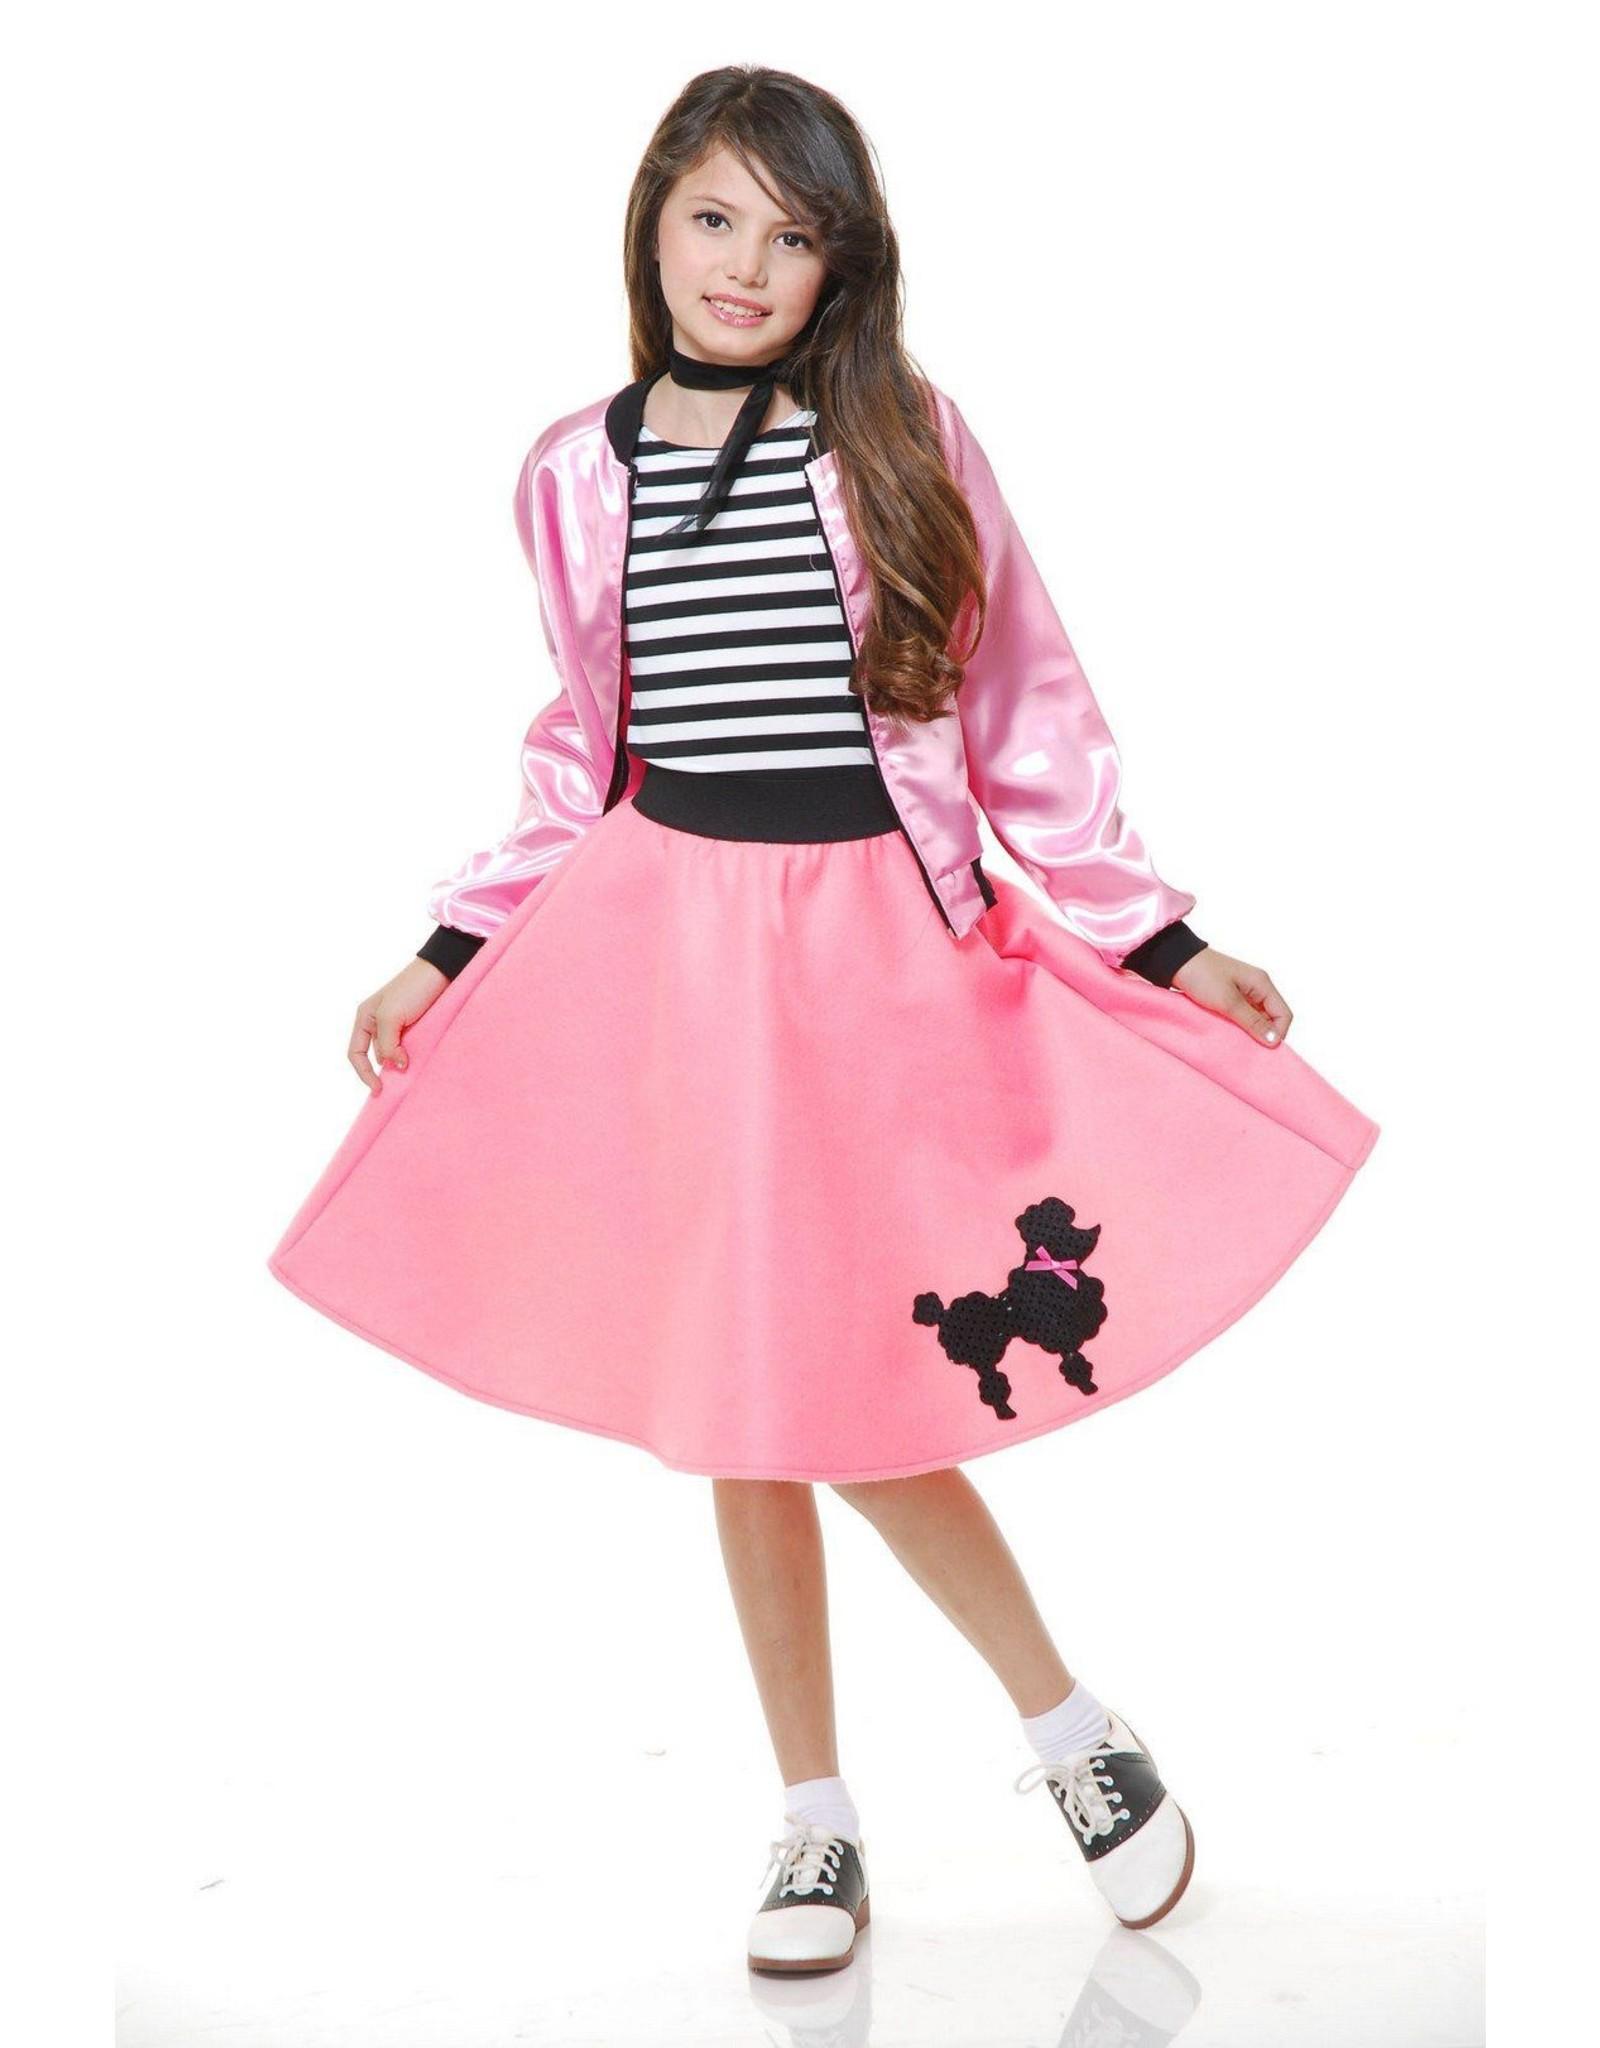 Charades Poodle Skirt Pink Child